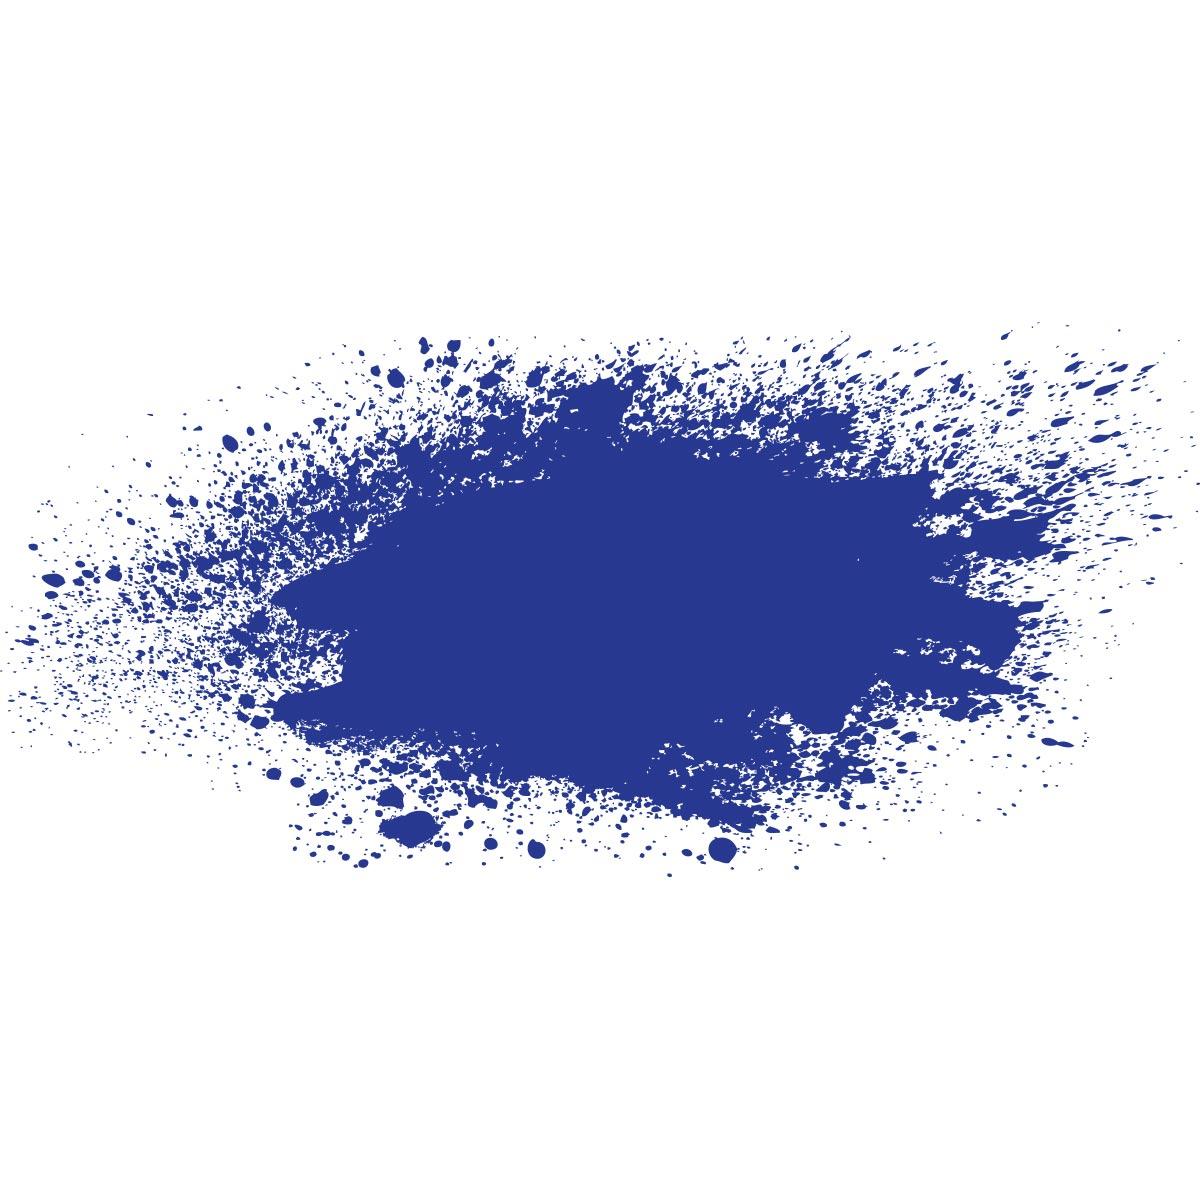 FolkArt ® Stencil Spray™ Acrylic Paint - Dark Blue, 2 oz.